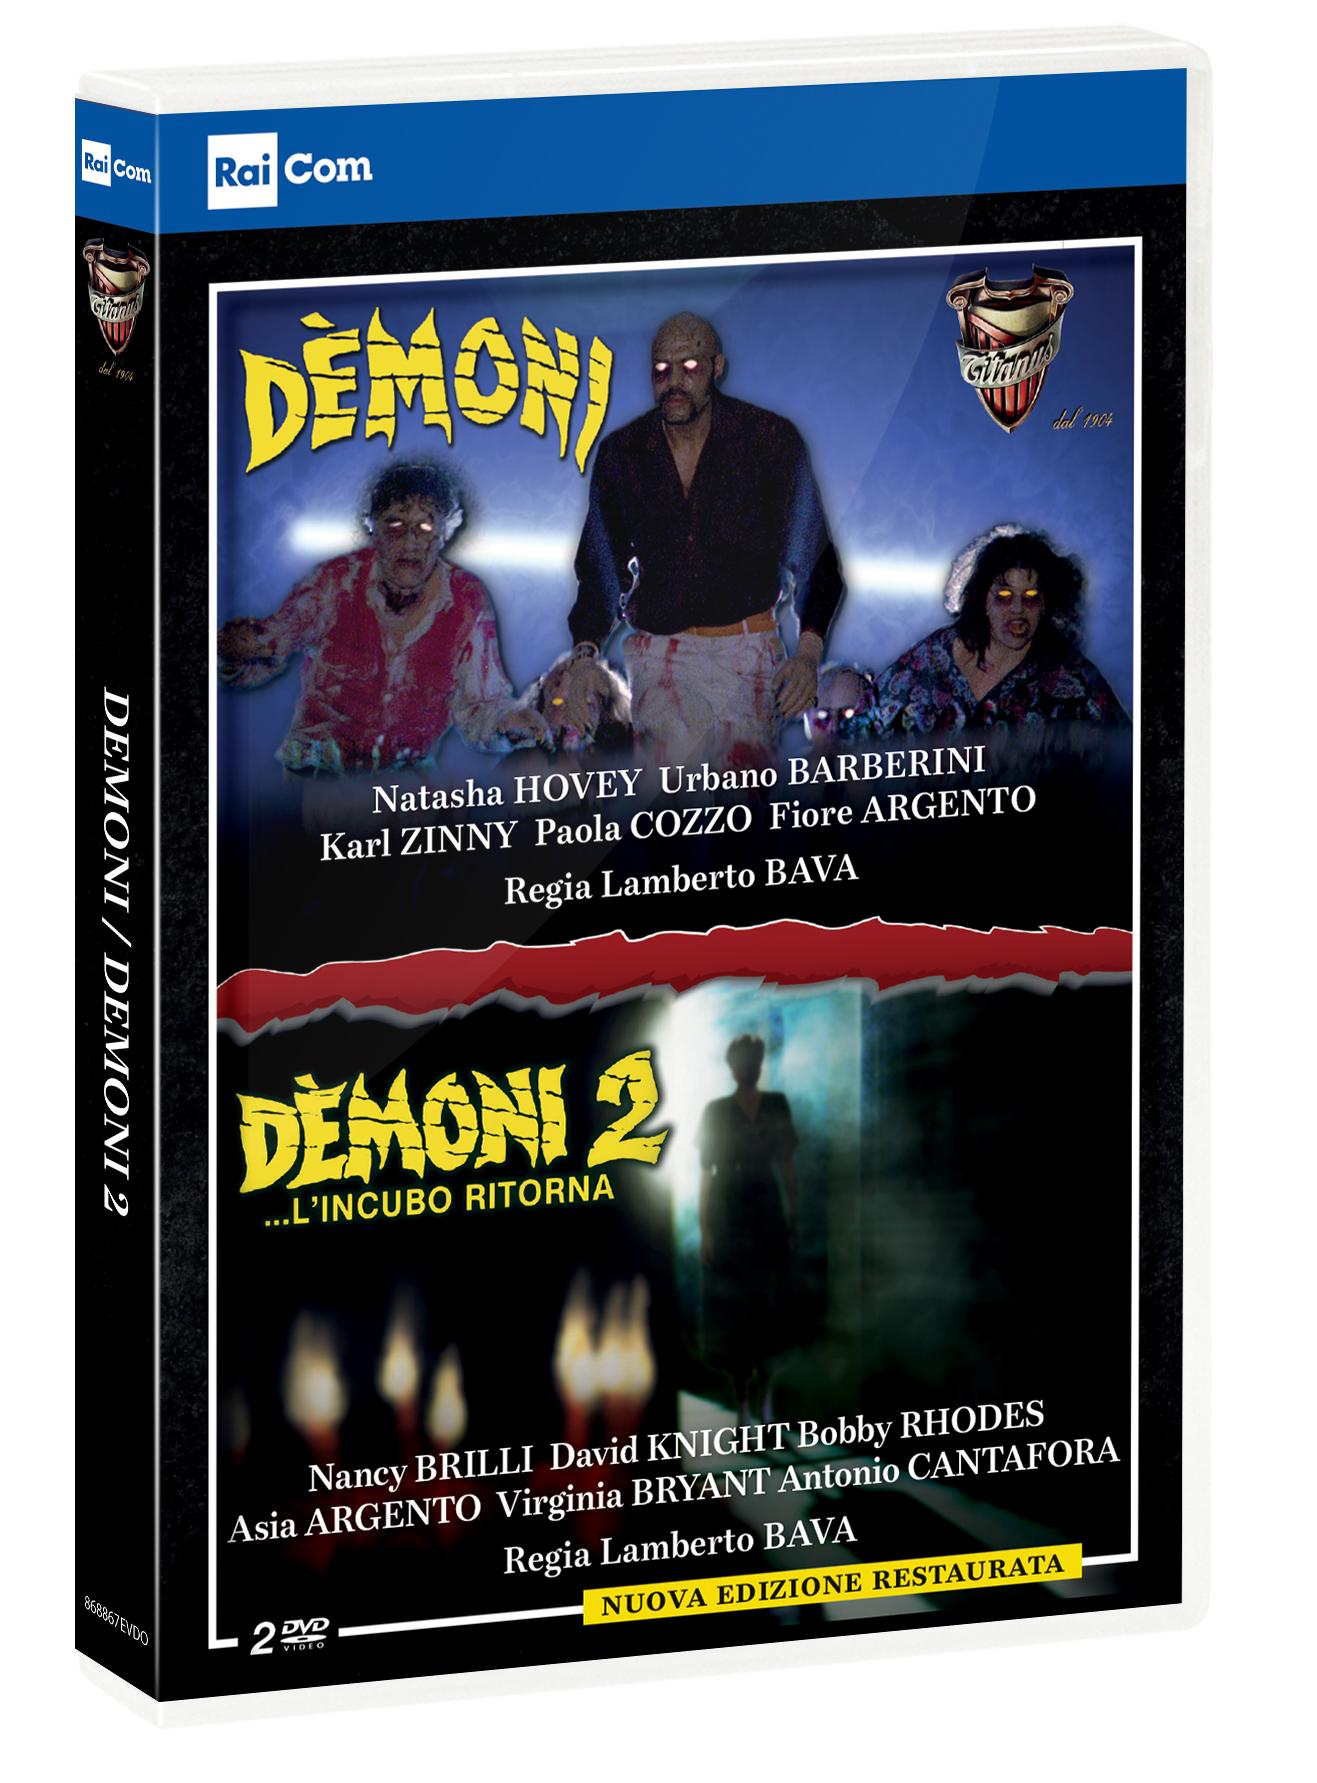 COF.DEMONI / DEMONI 2 (2 DVD) (DVD)